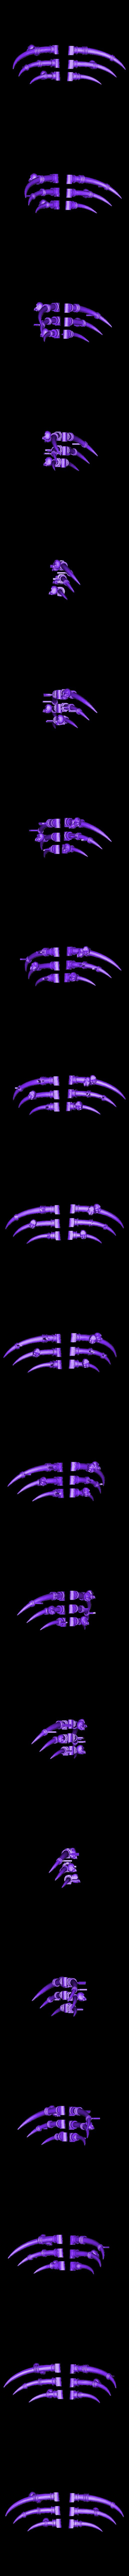 Chair_Tusks.stl Download free 3MF file One-Armed Dino-Jesus & His Pet Tyrannosaur • 3D printing model, EmanG